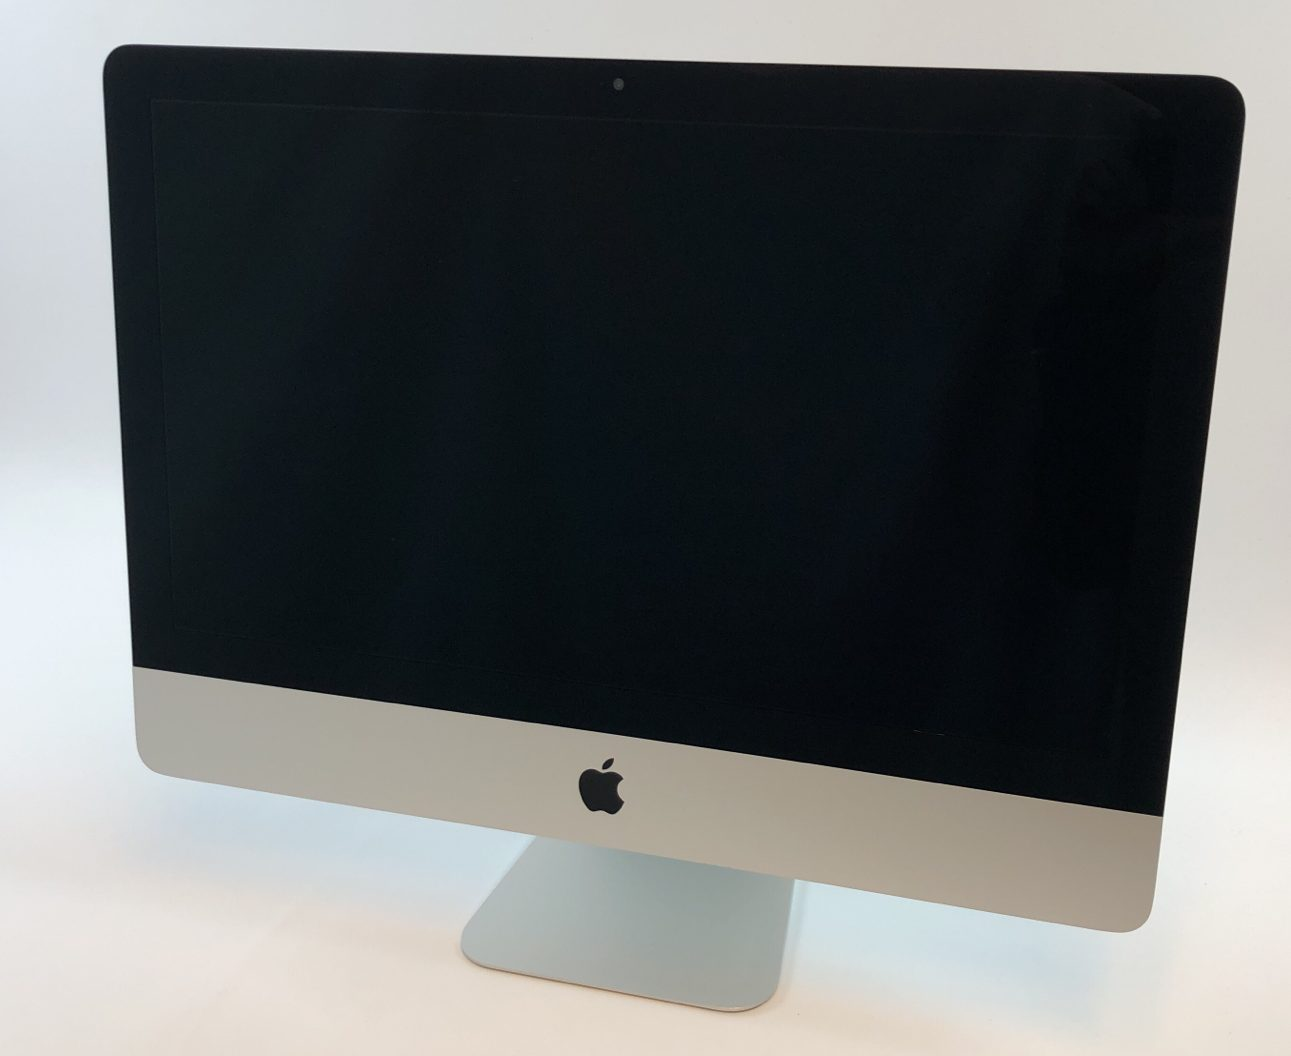 "iMac 21.5"" Late 2013 (Intel Quad-Core i5 2.7 GHz 8 GB RAM 1 TB HDD), Intel Quad-Core i5 2.7 GHz, 8 GB RAM, 1 TB HDD, Kuva 1"